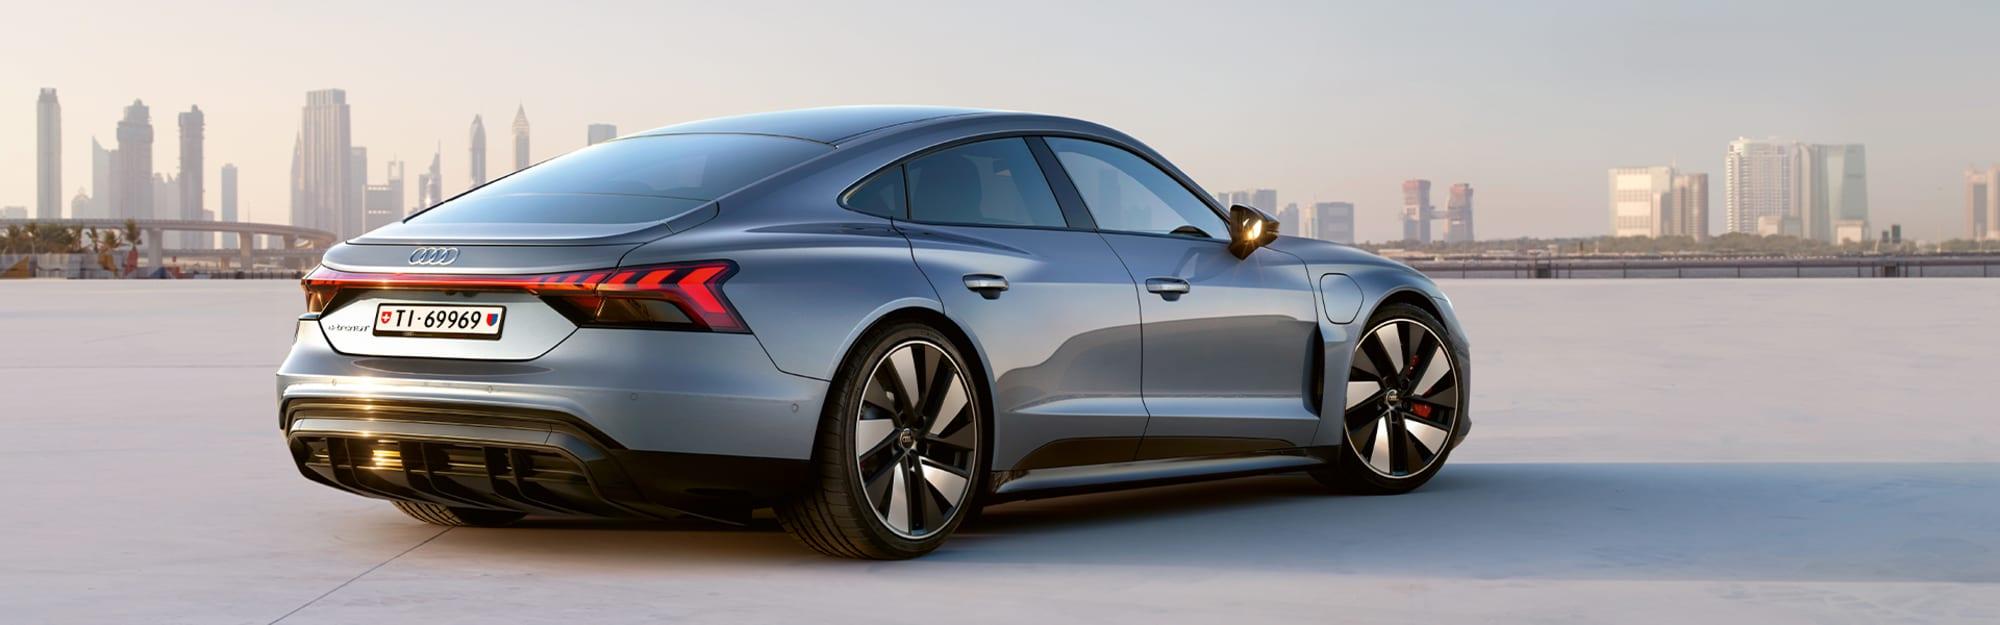 Audi_etronGT_Haendlerwebseite_1920x600px_i